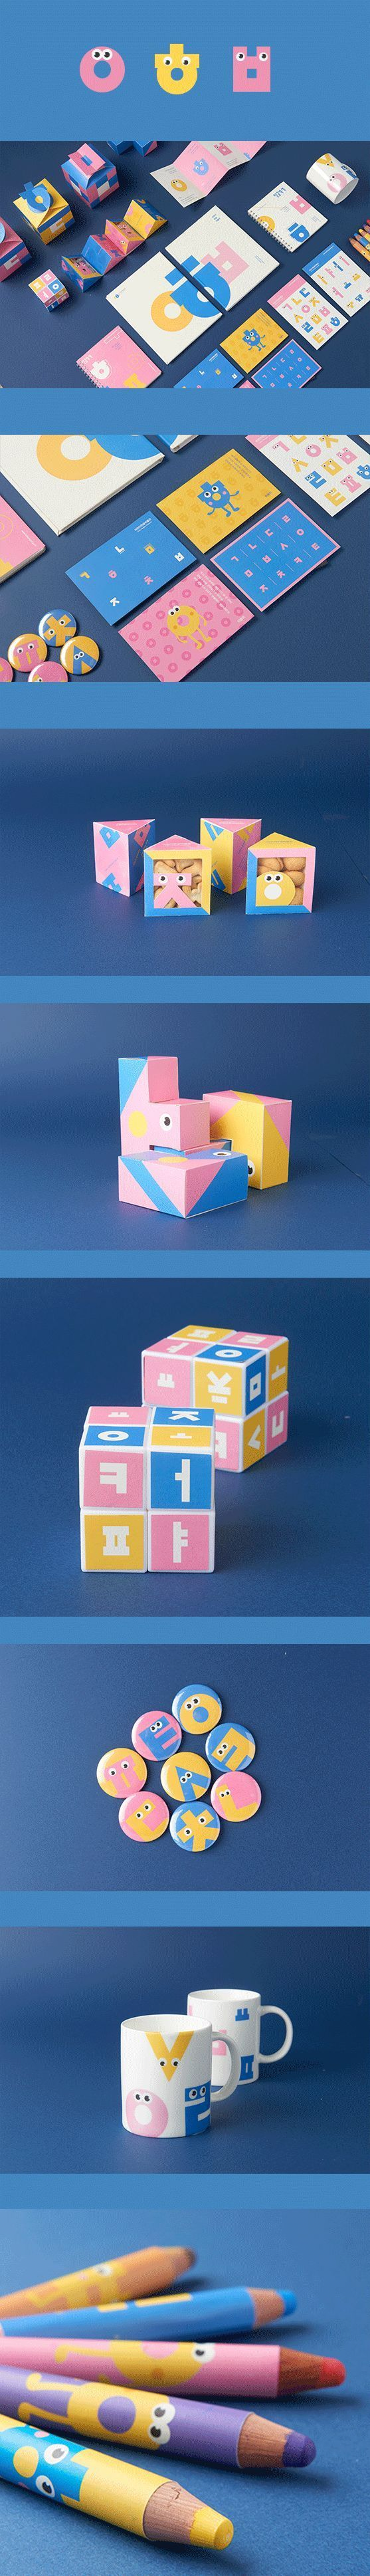 Kid Hangeul Museum Branding by JJungJi | Fivestar Branding – Design and Branding Agency & Inspiration Gallery: